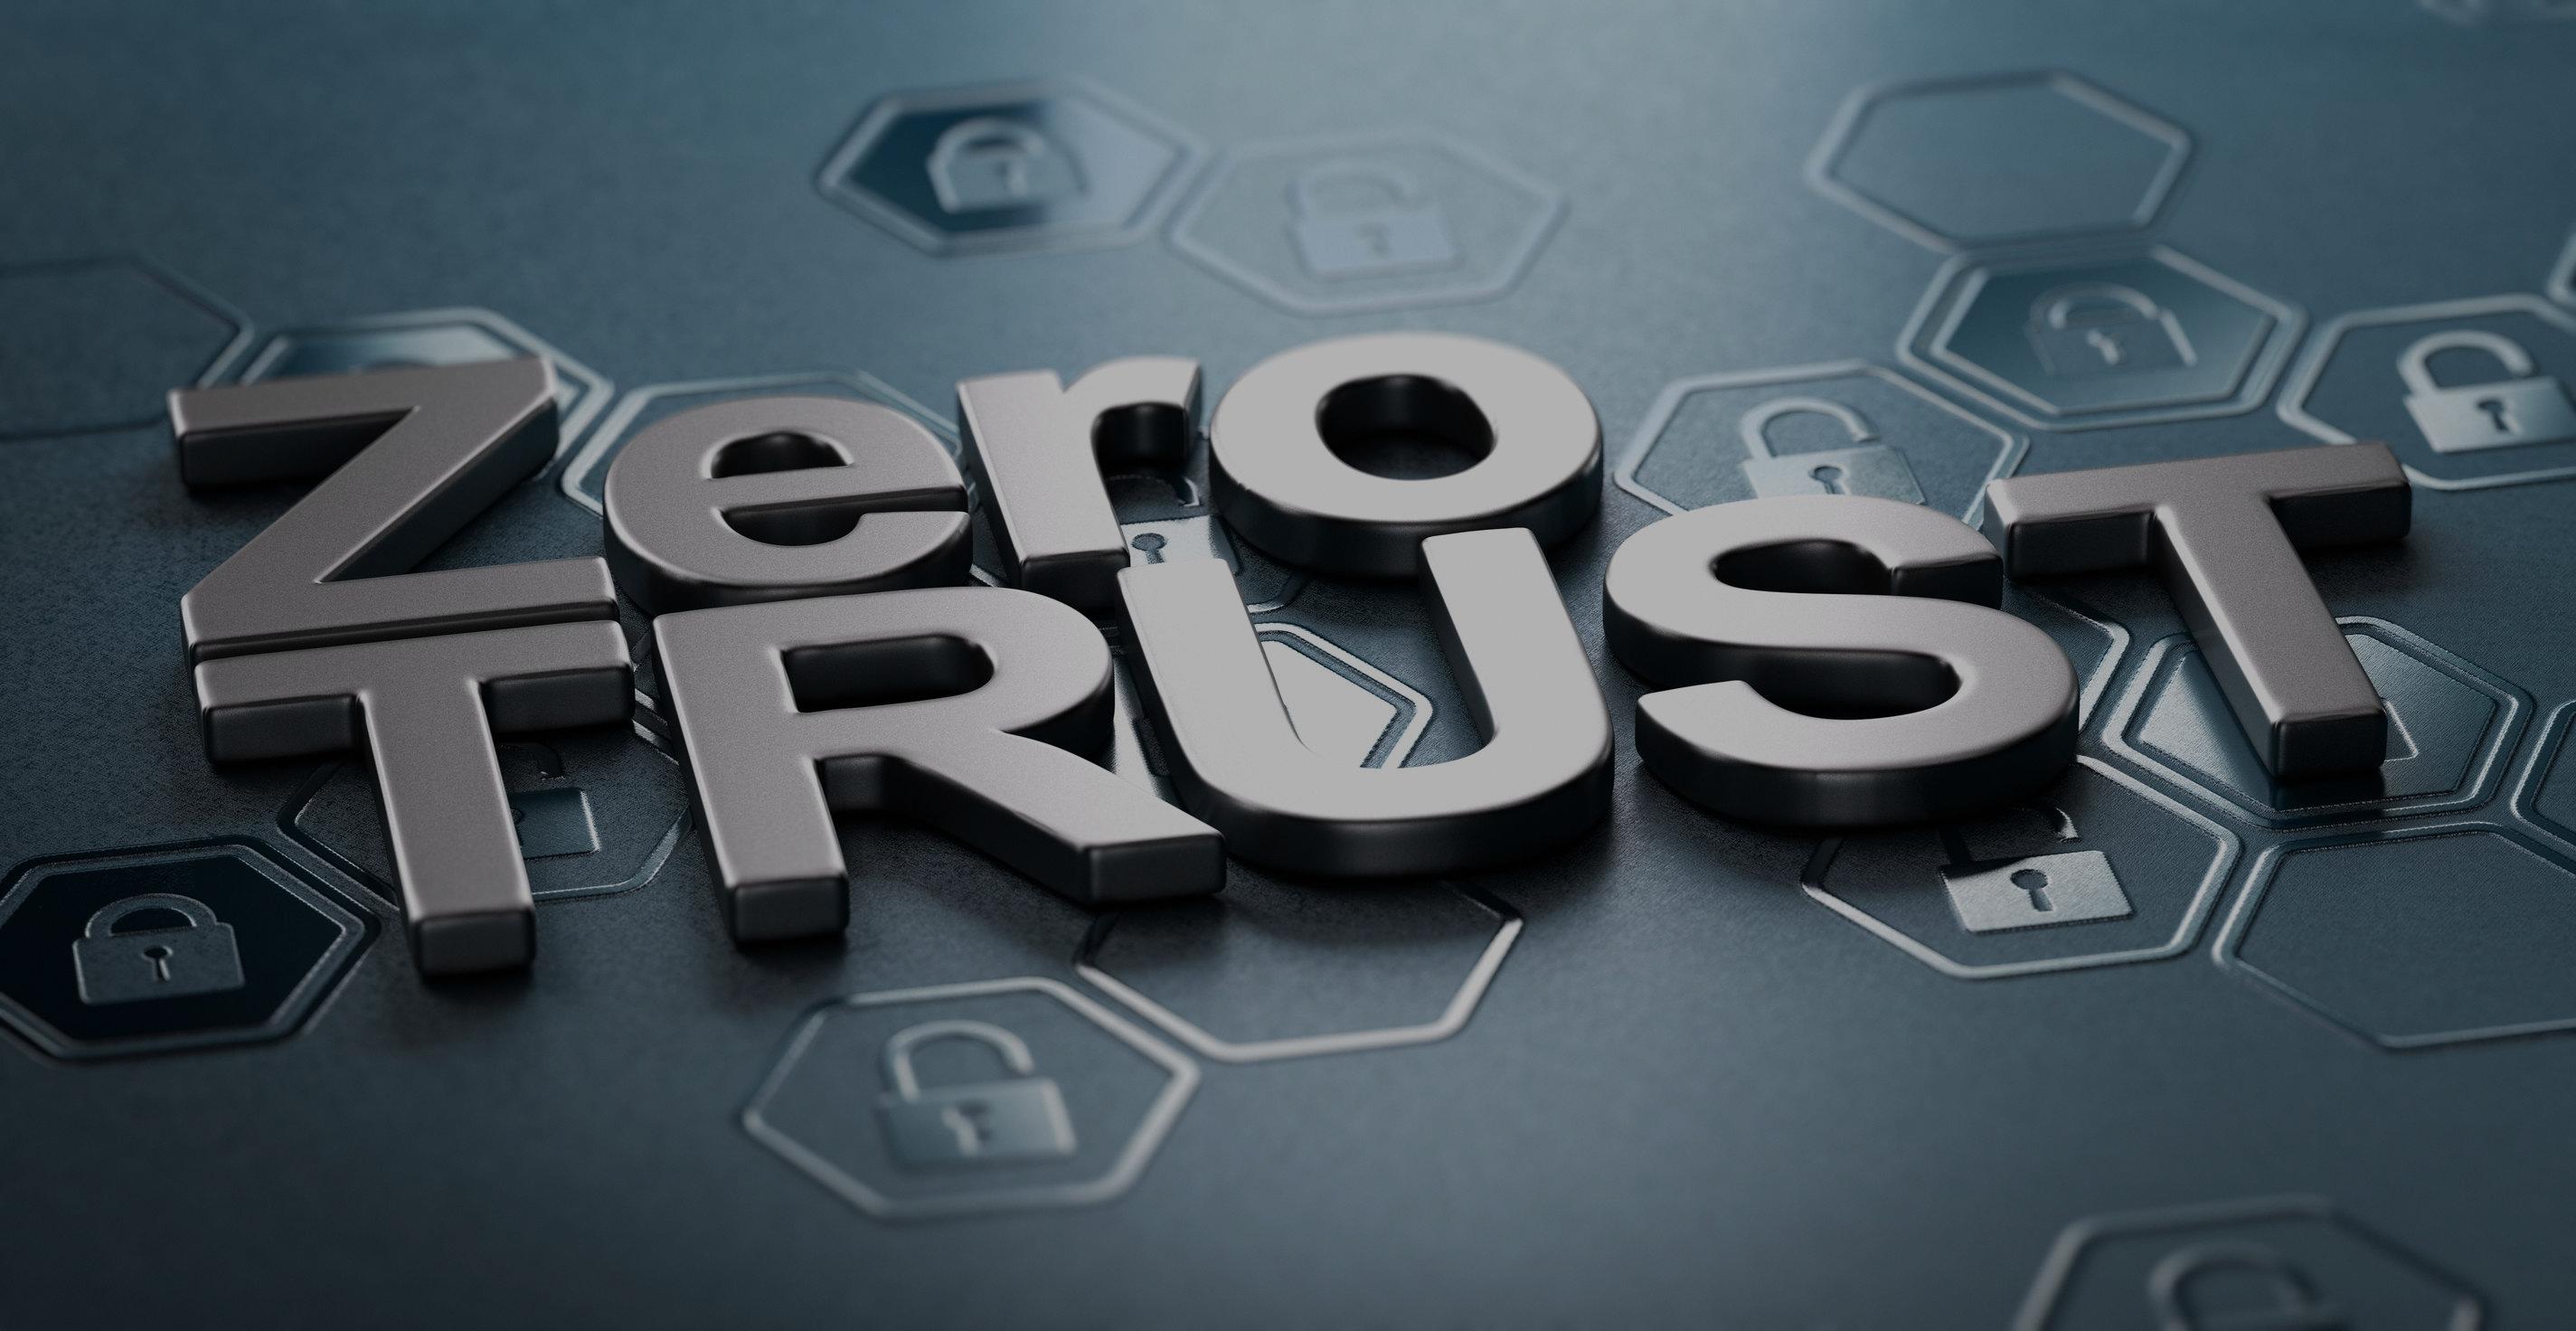 infoguard-blog-airlock-zero-trust